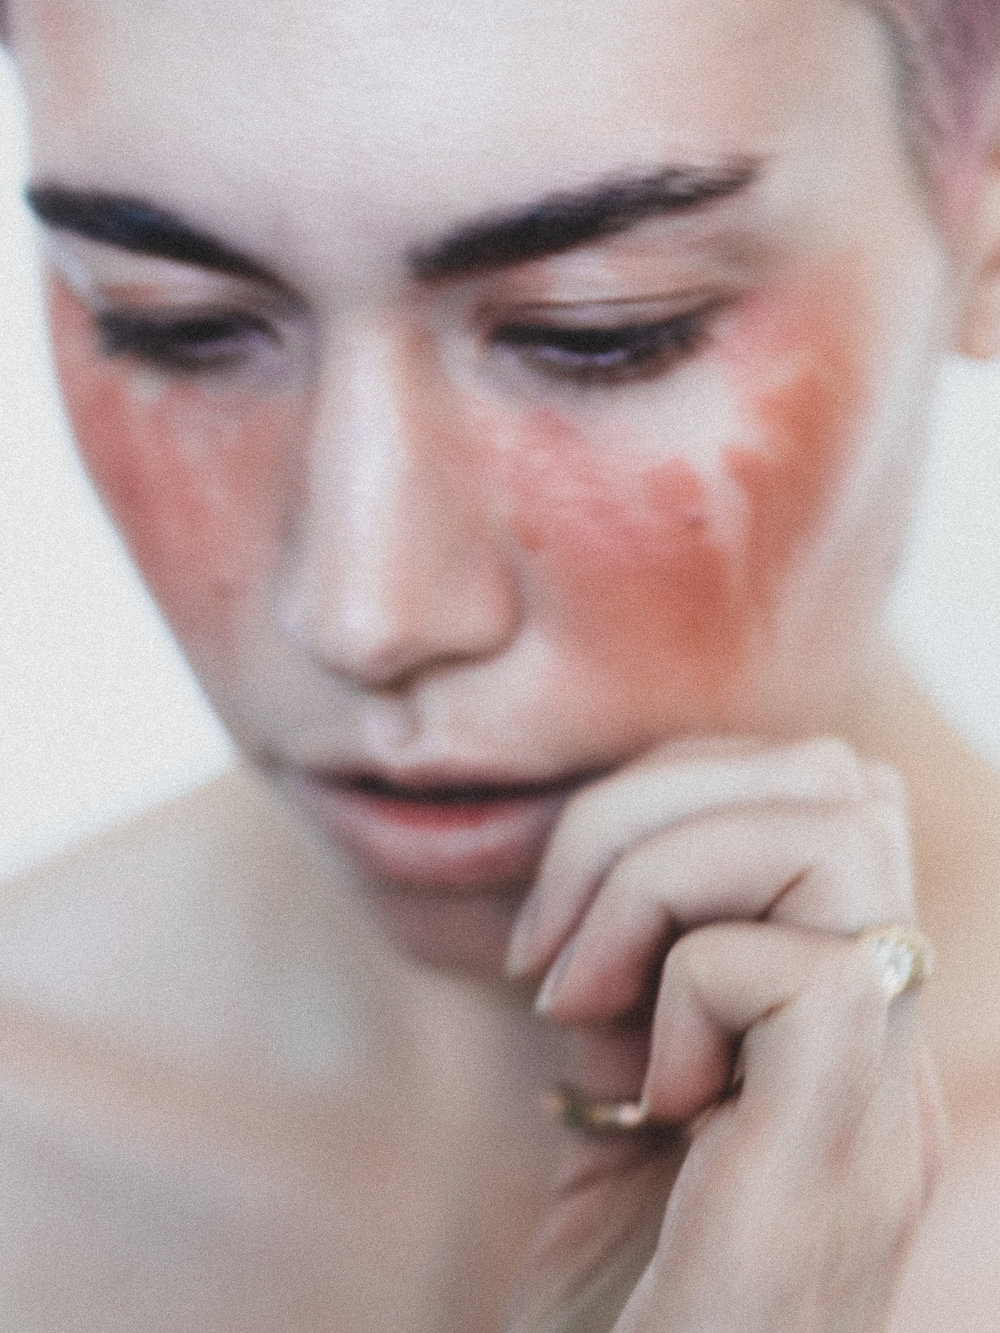 Blush: Hiro Cosmetics Mineral Blush in  A Clockwork Peach